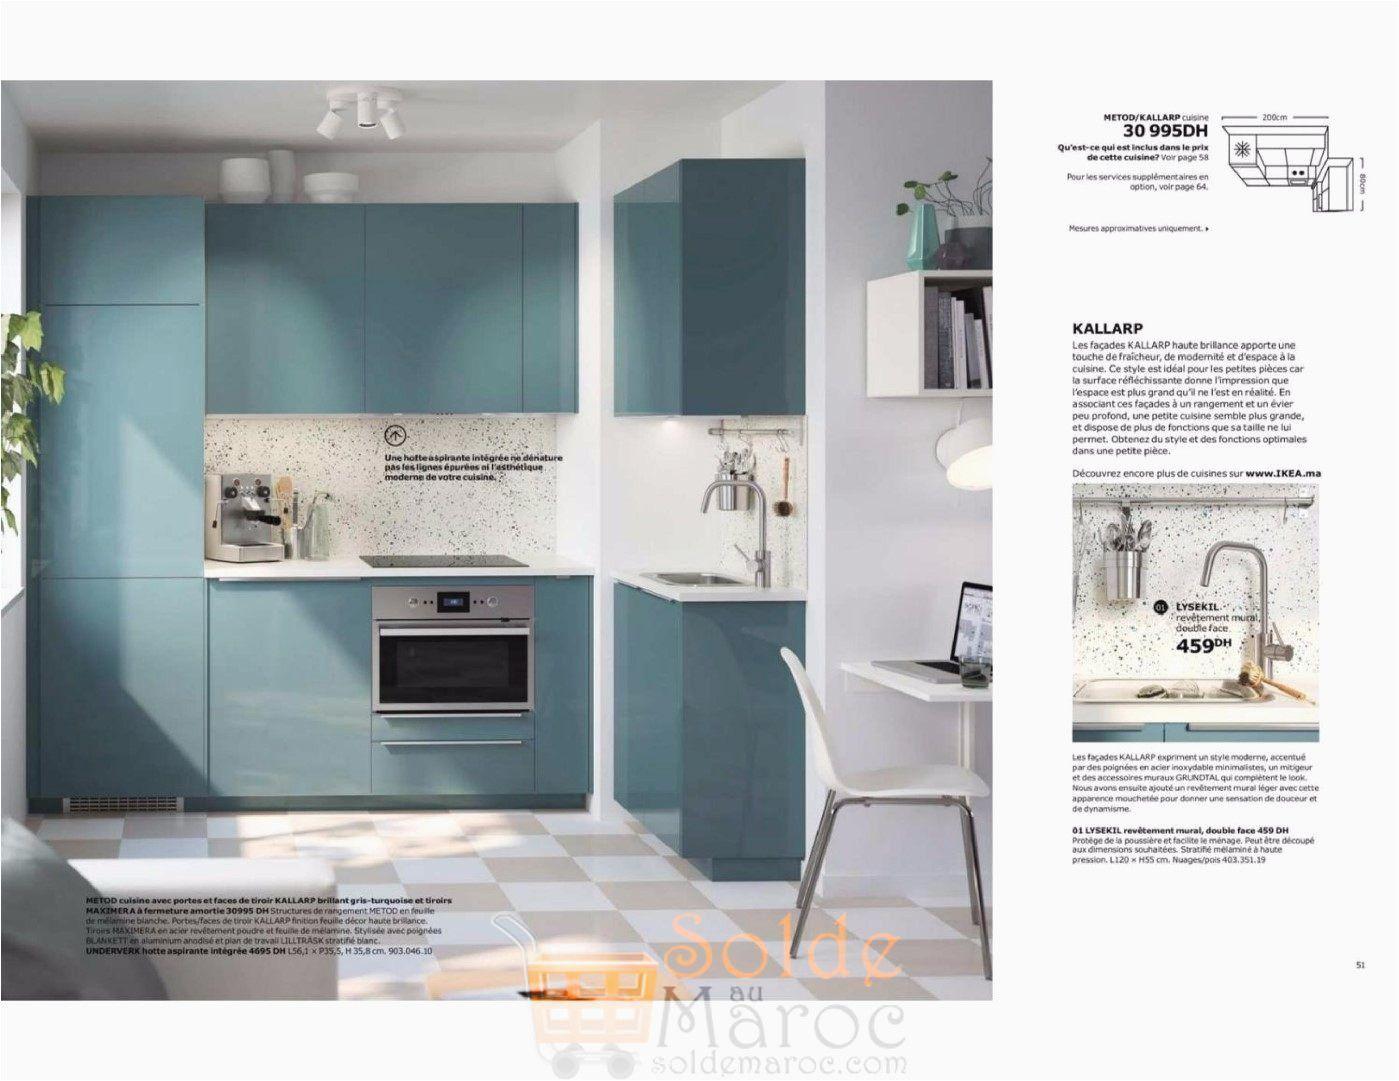 Accessoires Salle De Bain Ikea Maroc Luxe Catalogue Ikea